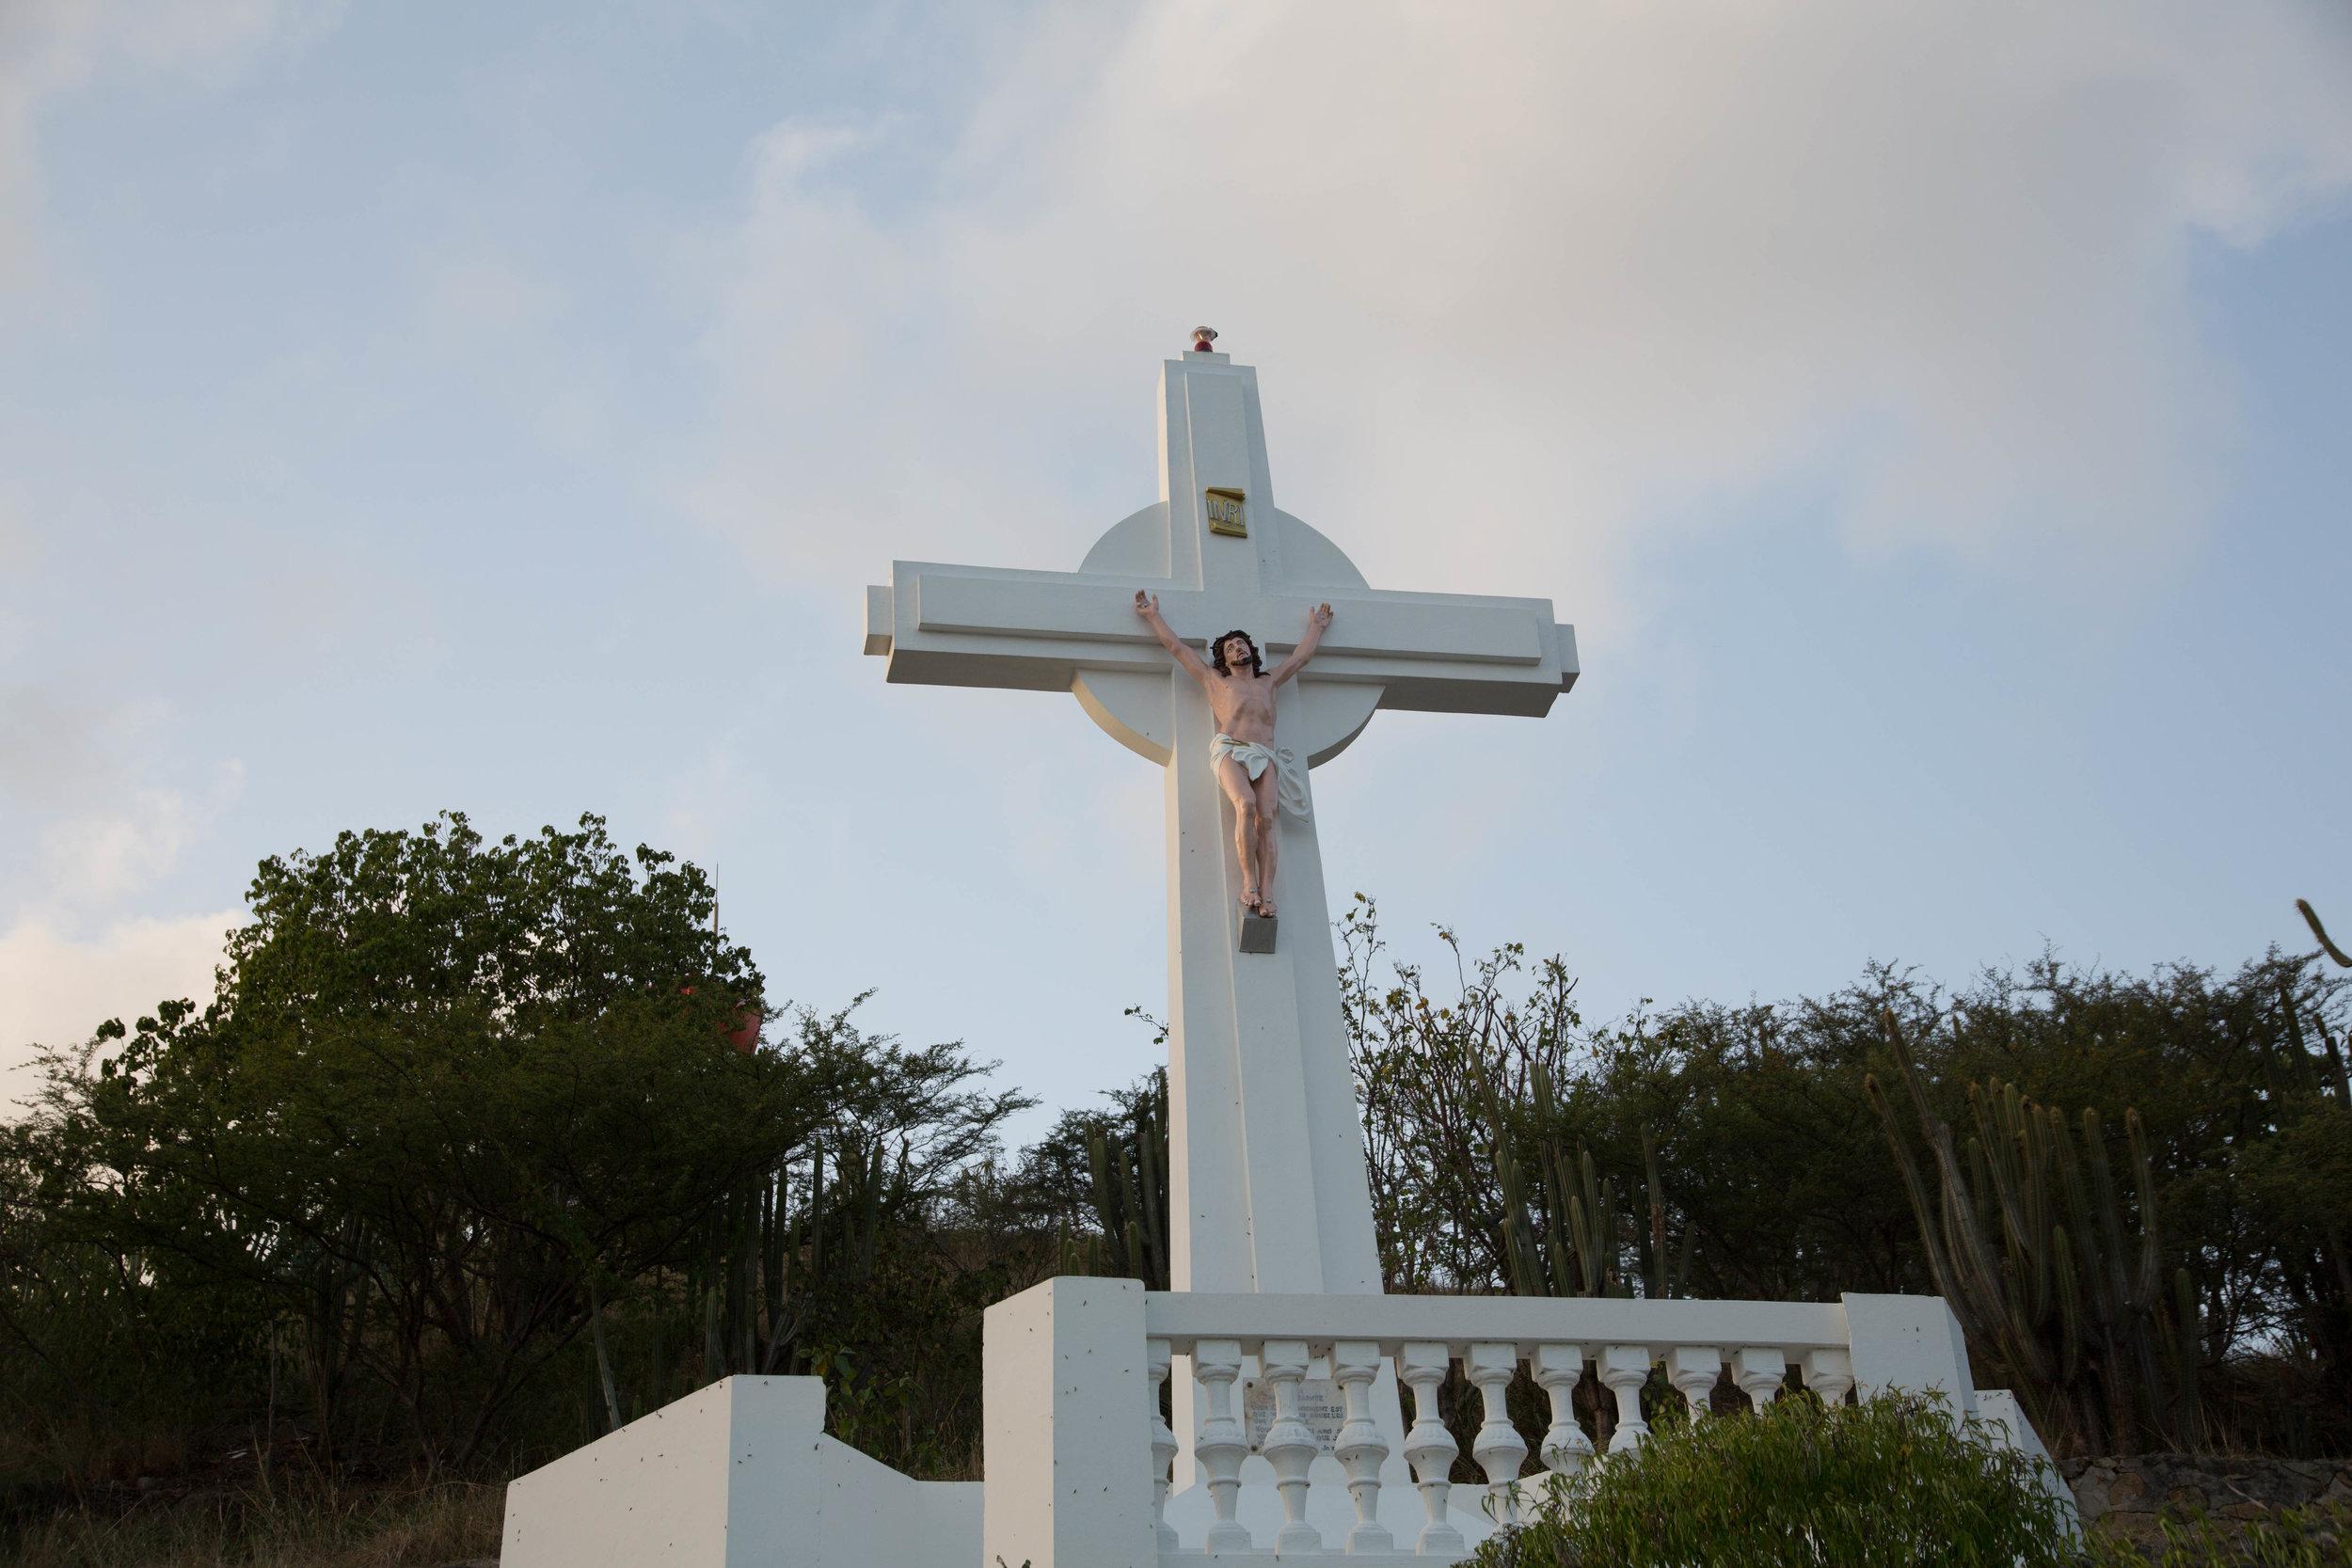 St Barths Port Statue by Stephenie_Rodriguez_.jpg